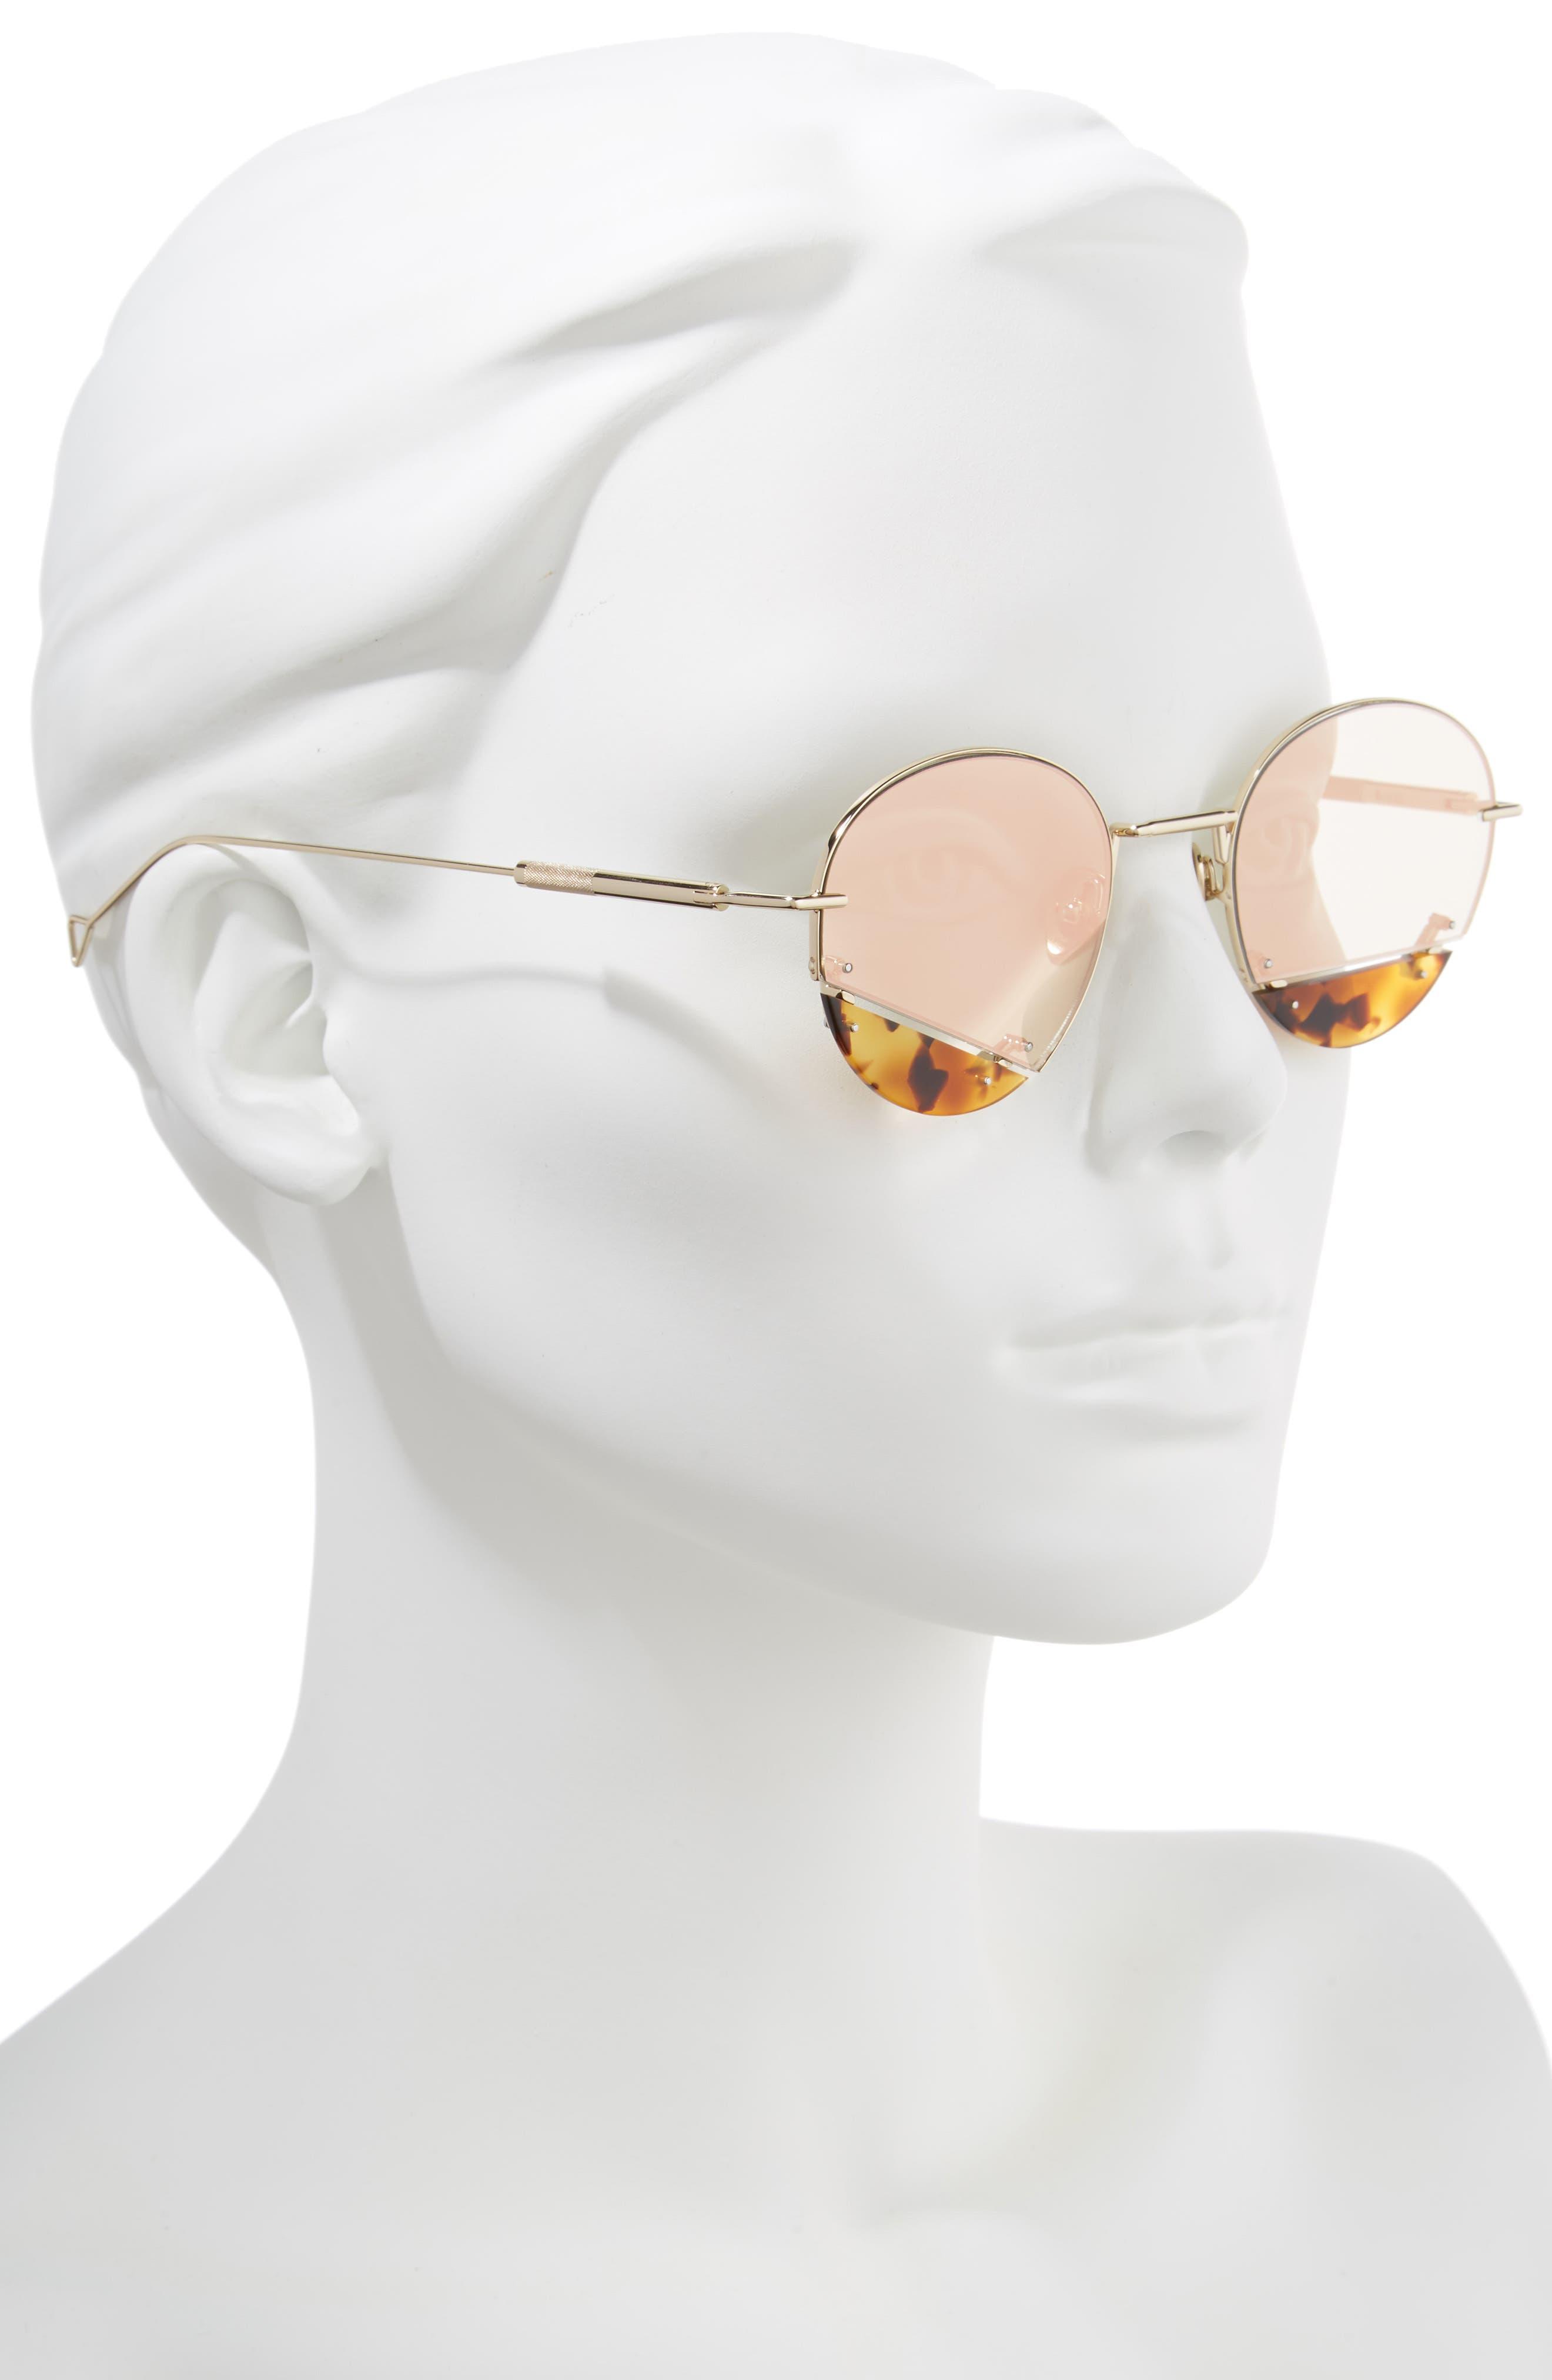 On the Corner 50mm Sunglasses,                             Alternate thumbnail 2, color,                             CHAMPAGNE